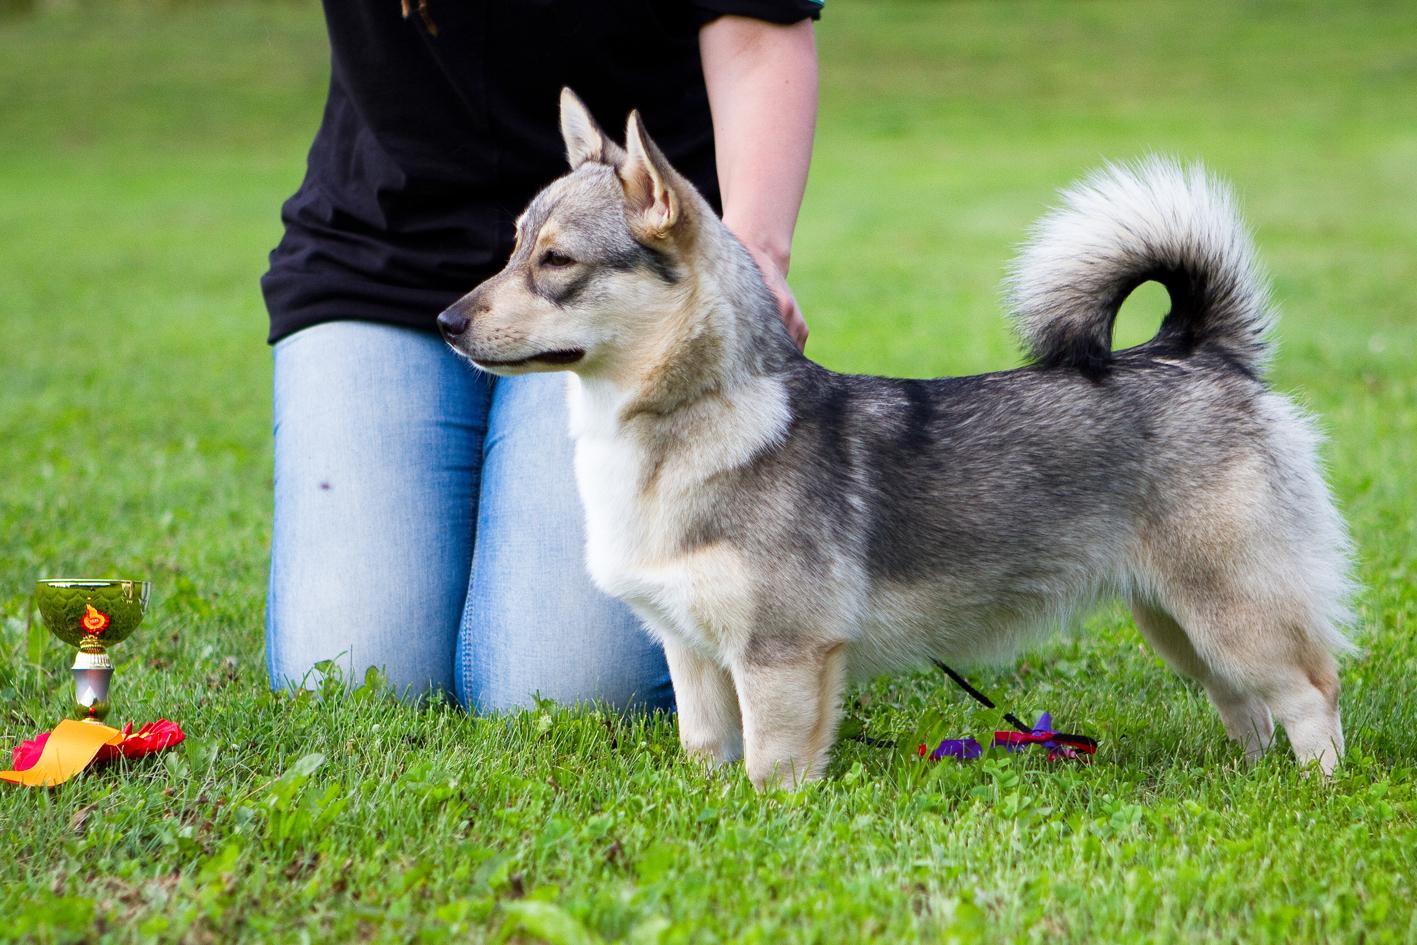 характер породы собаки шведский вальхунд